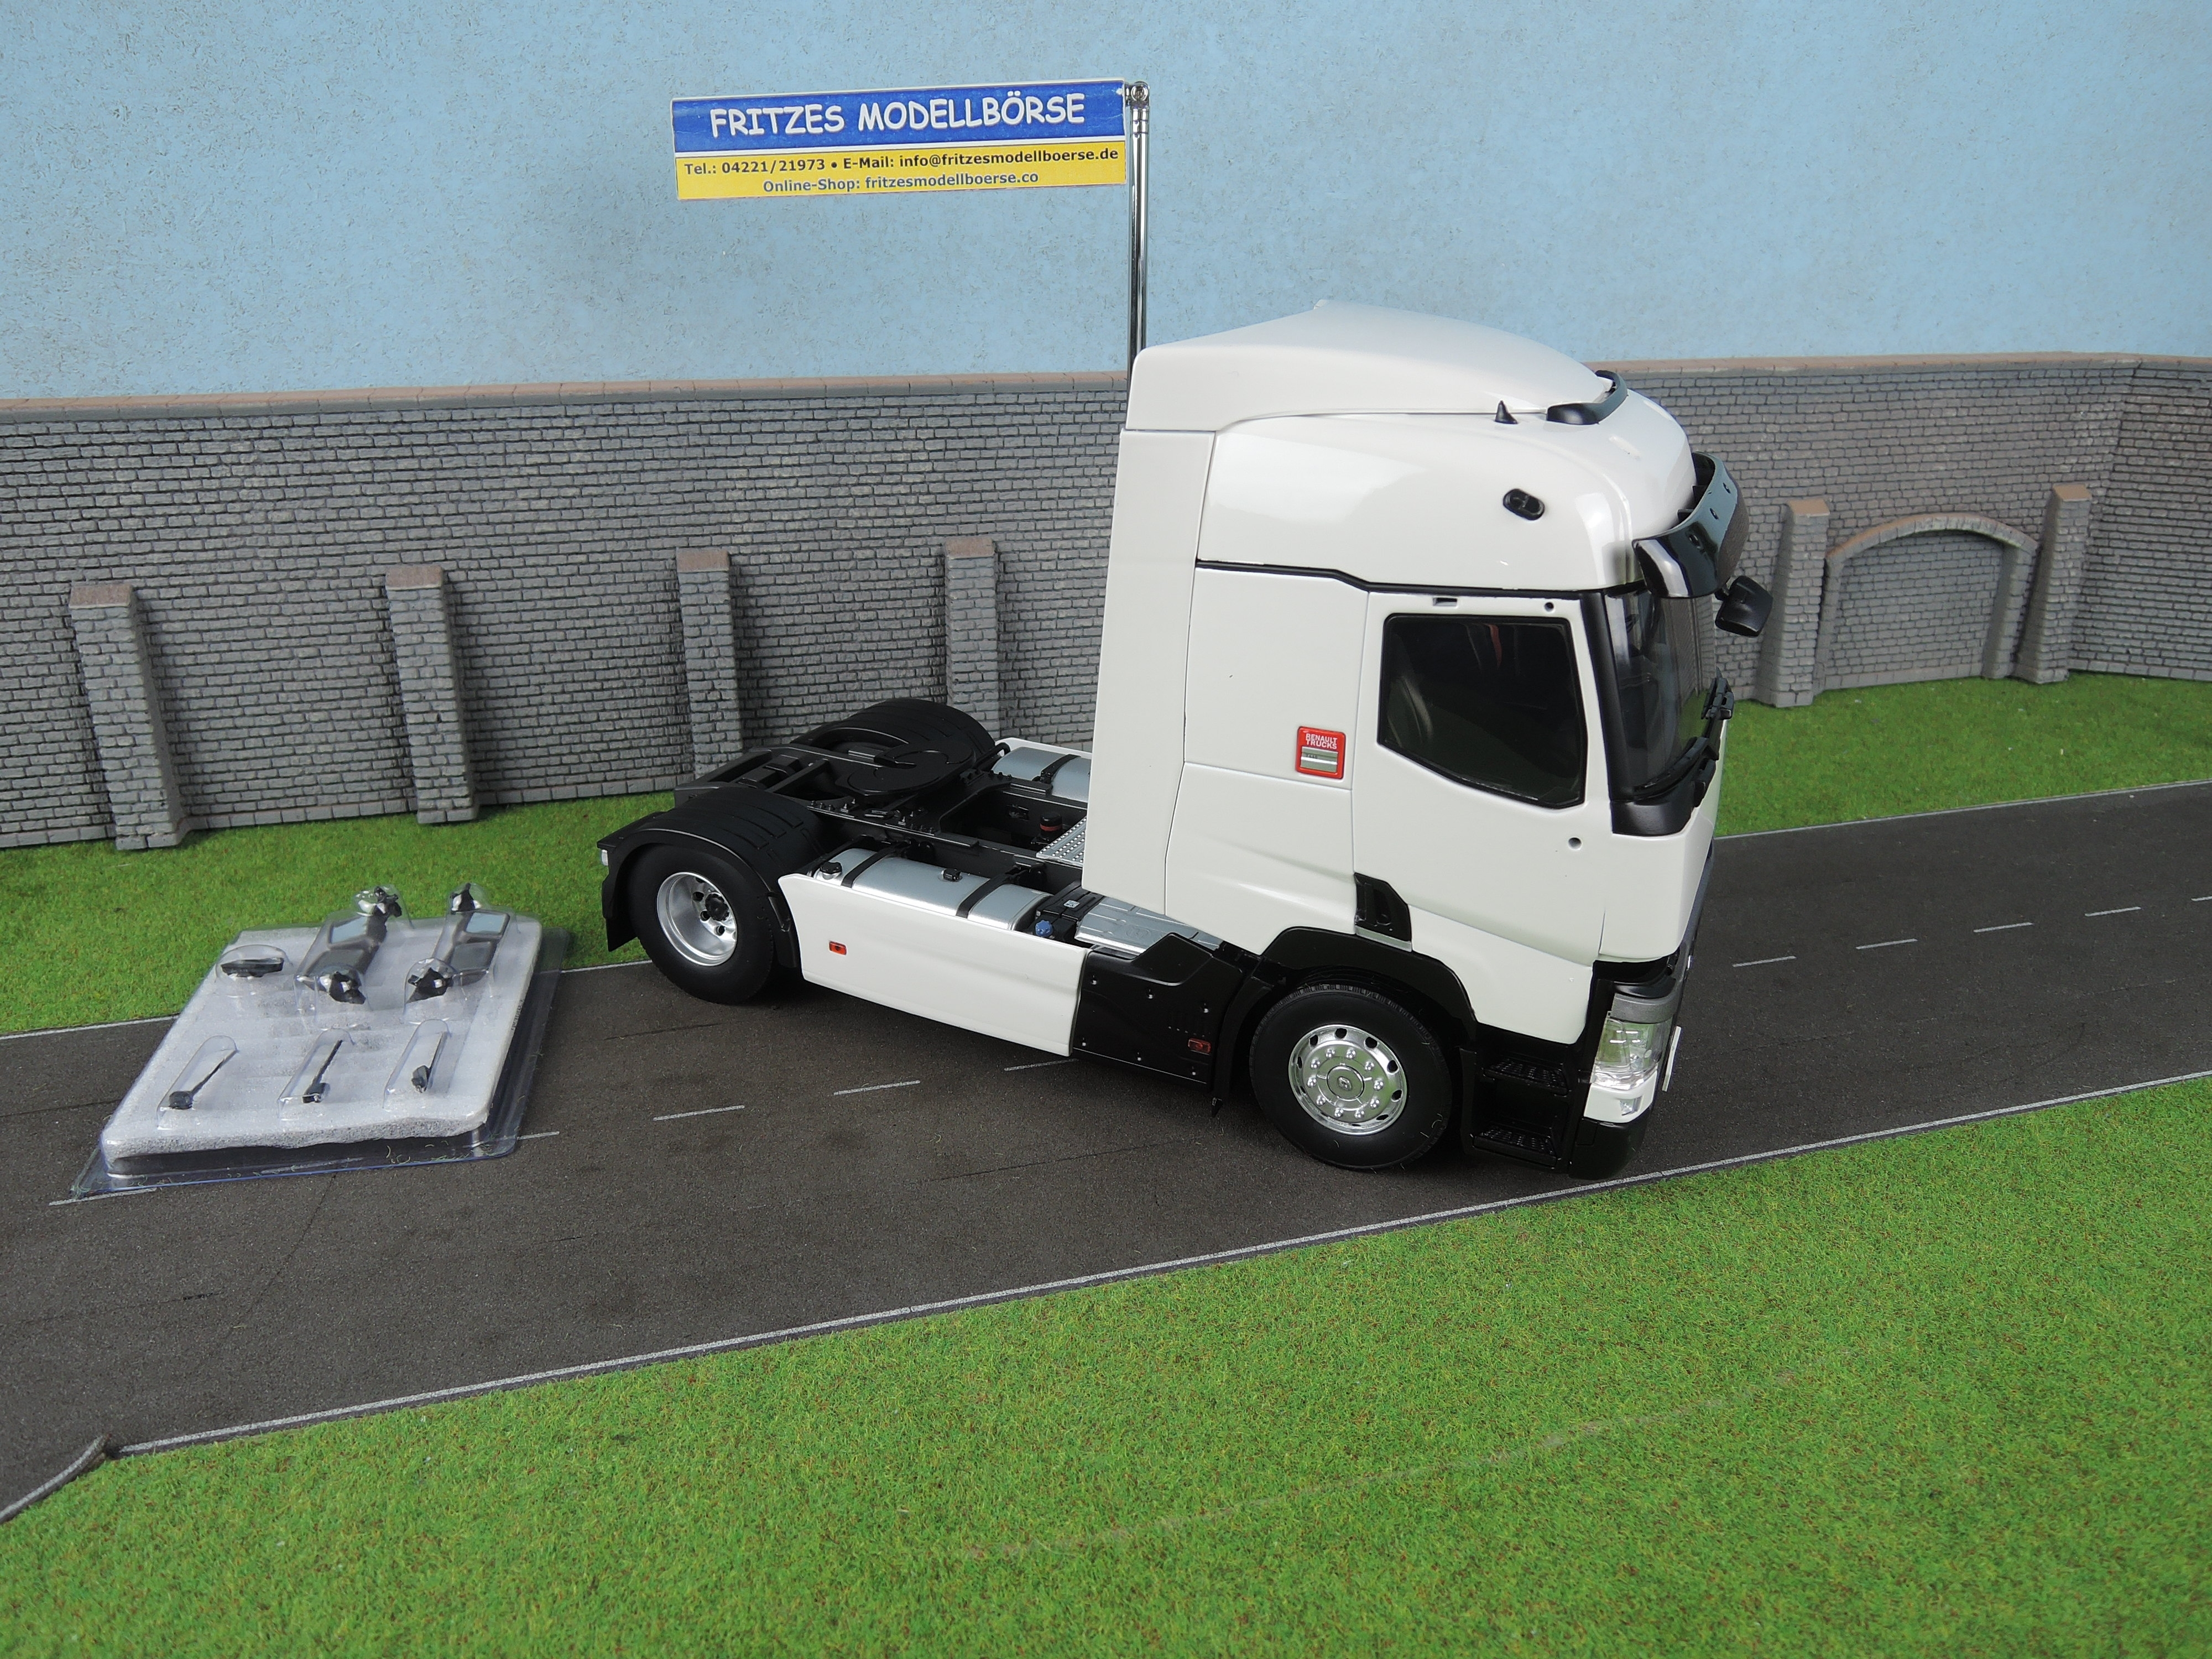 Zaktualizowano 111794-40 - Eligor - Renault T460 rigid truck tractor, white - 1 OF41